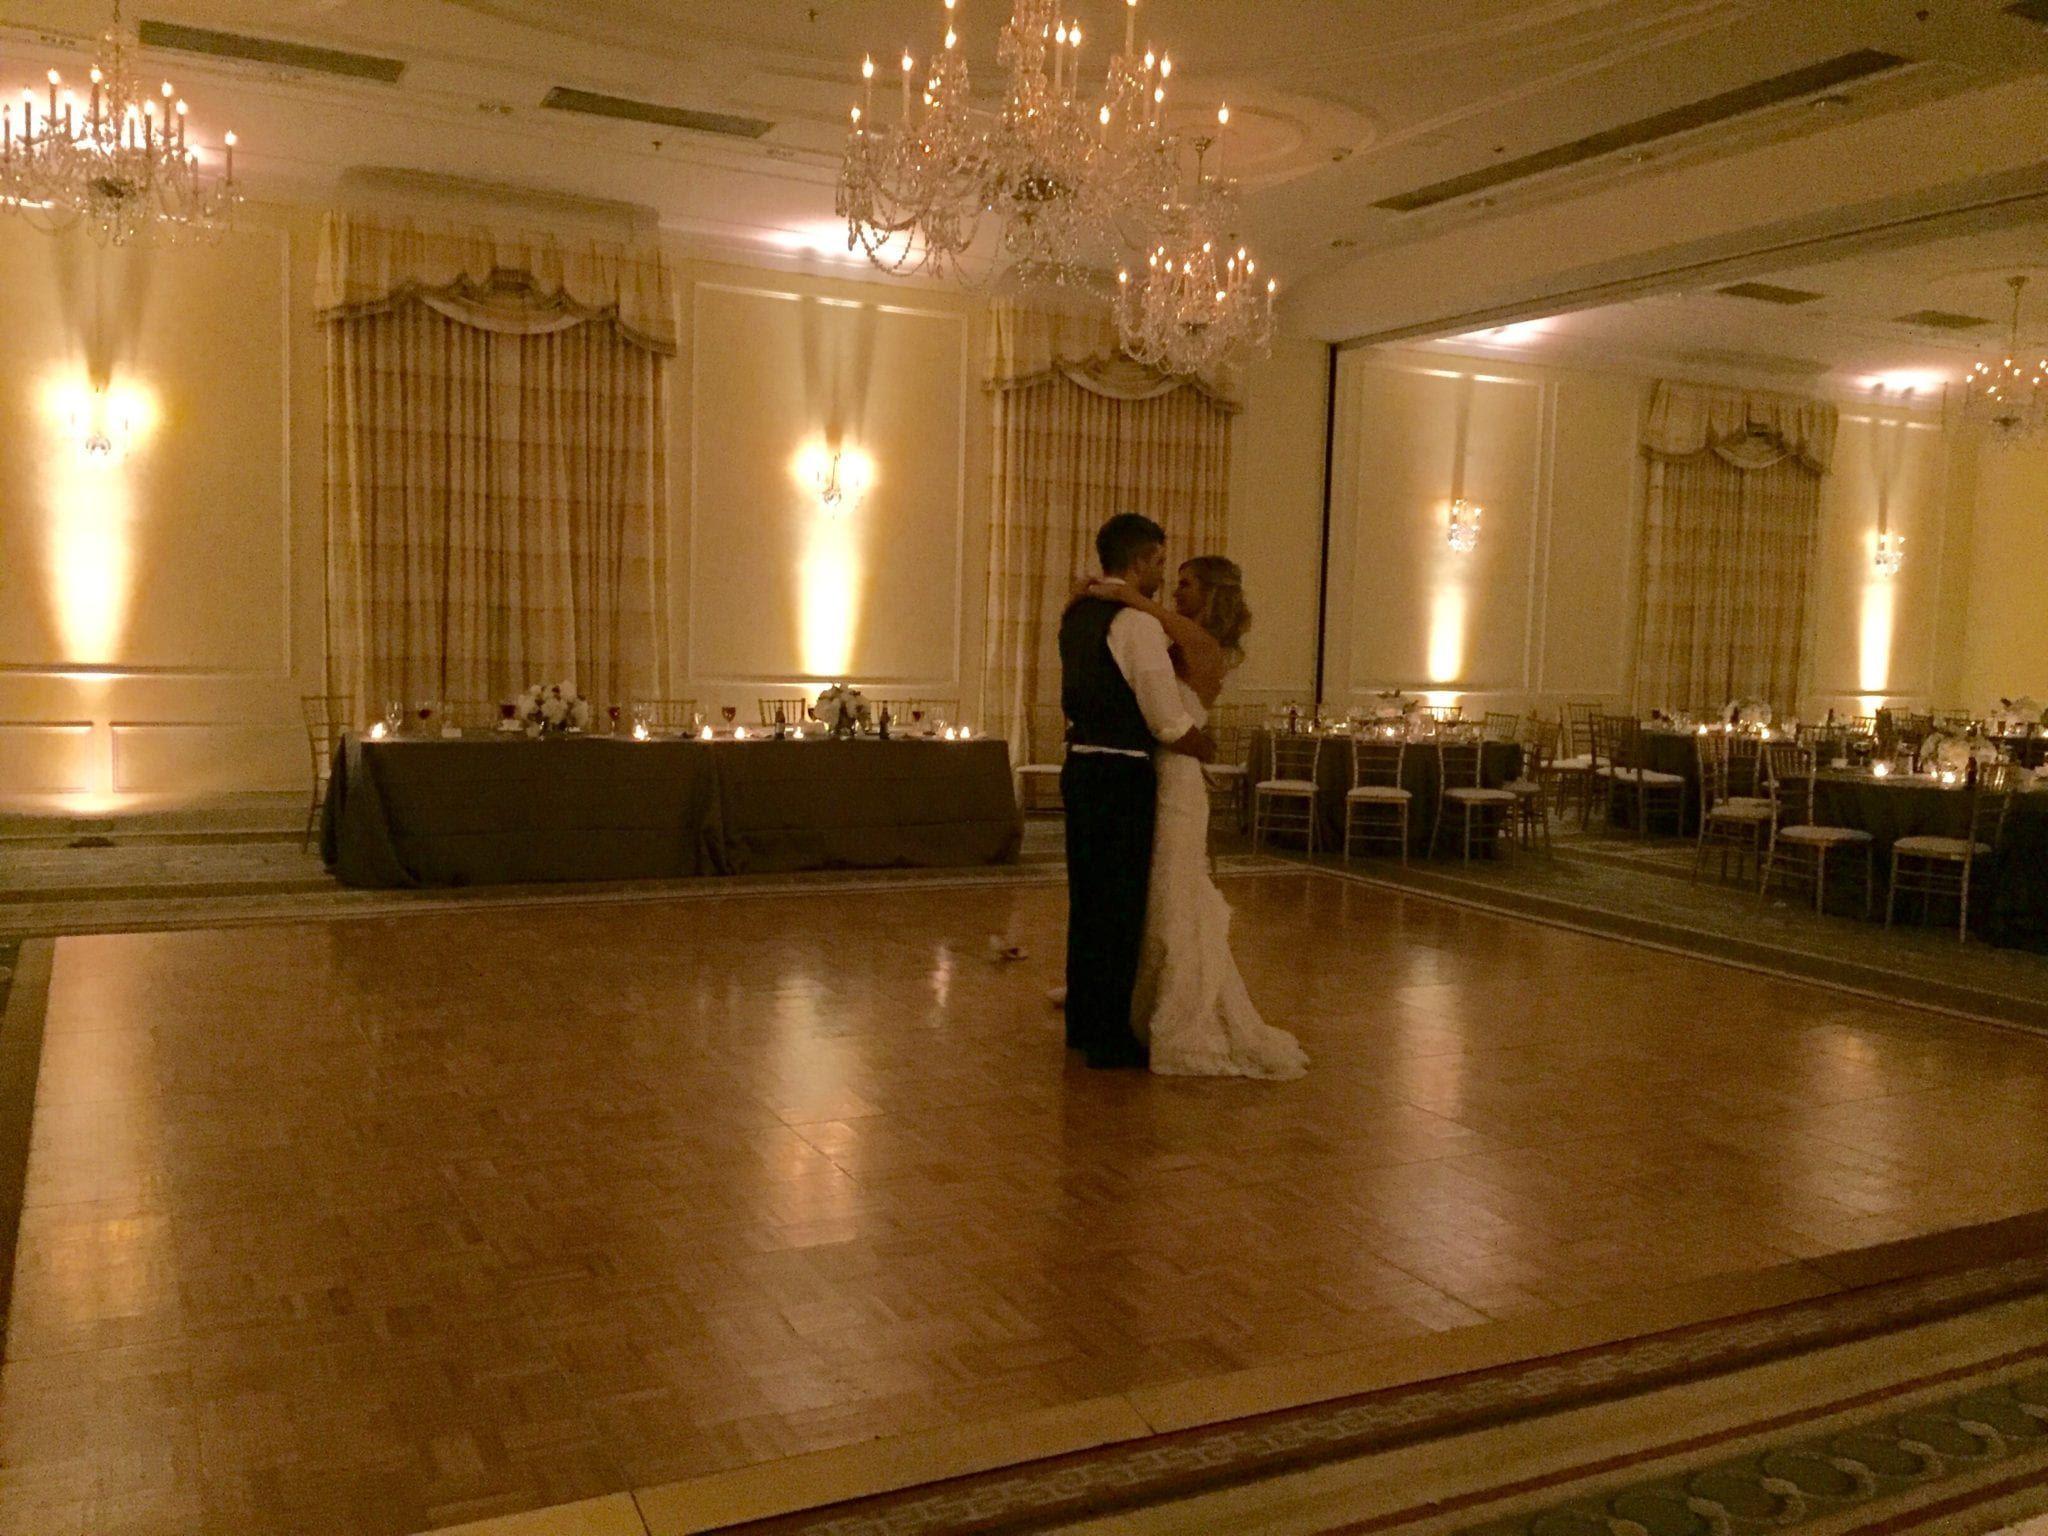 The wedding private last dance